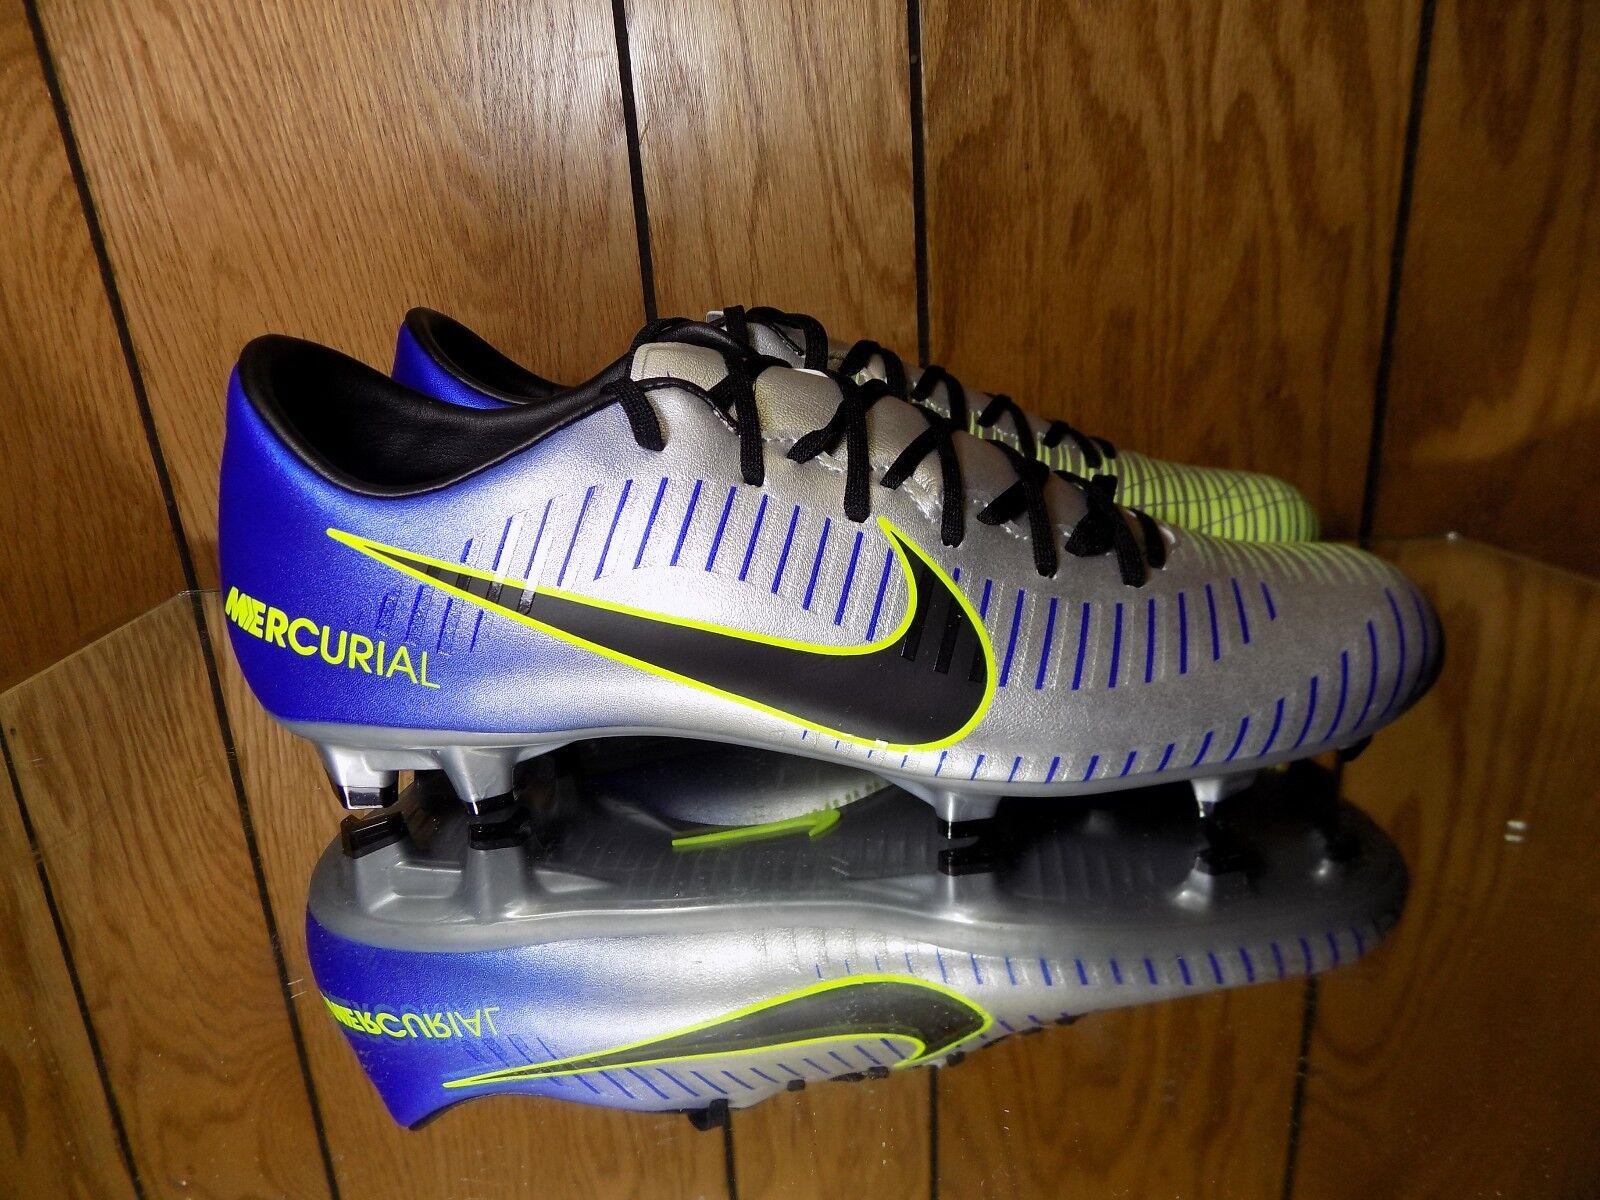 5f36a5ee1d5 Nike Mercurial Victory VI NJR FG Soccer Cleats Blue Chrome 921509 ...